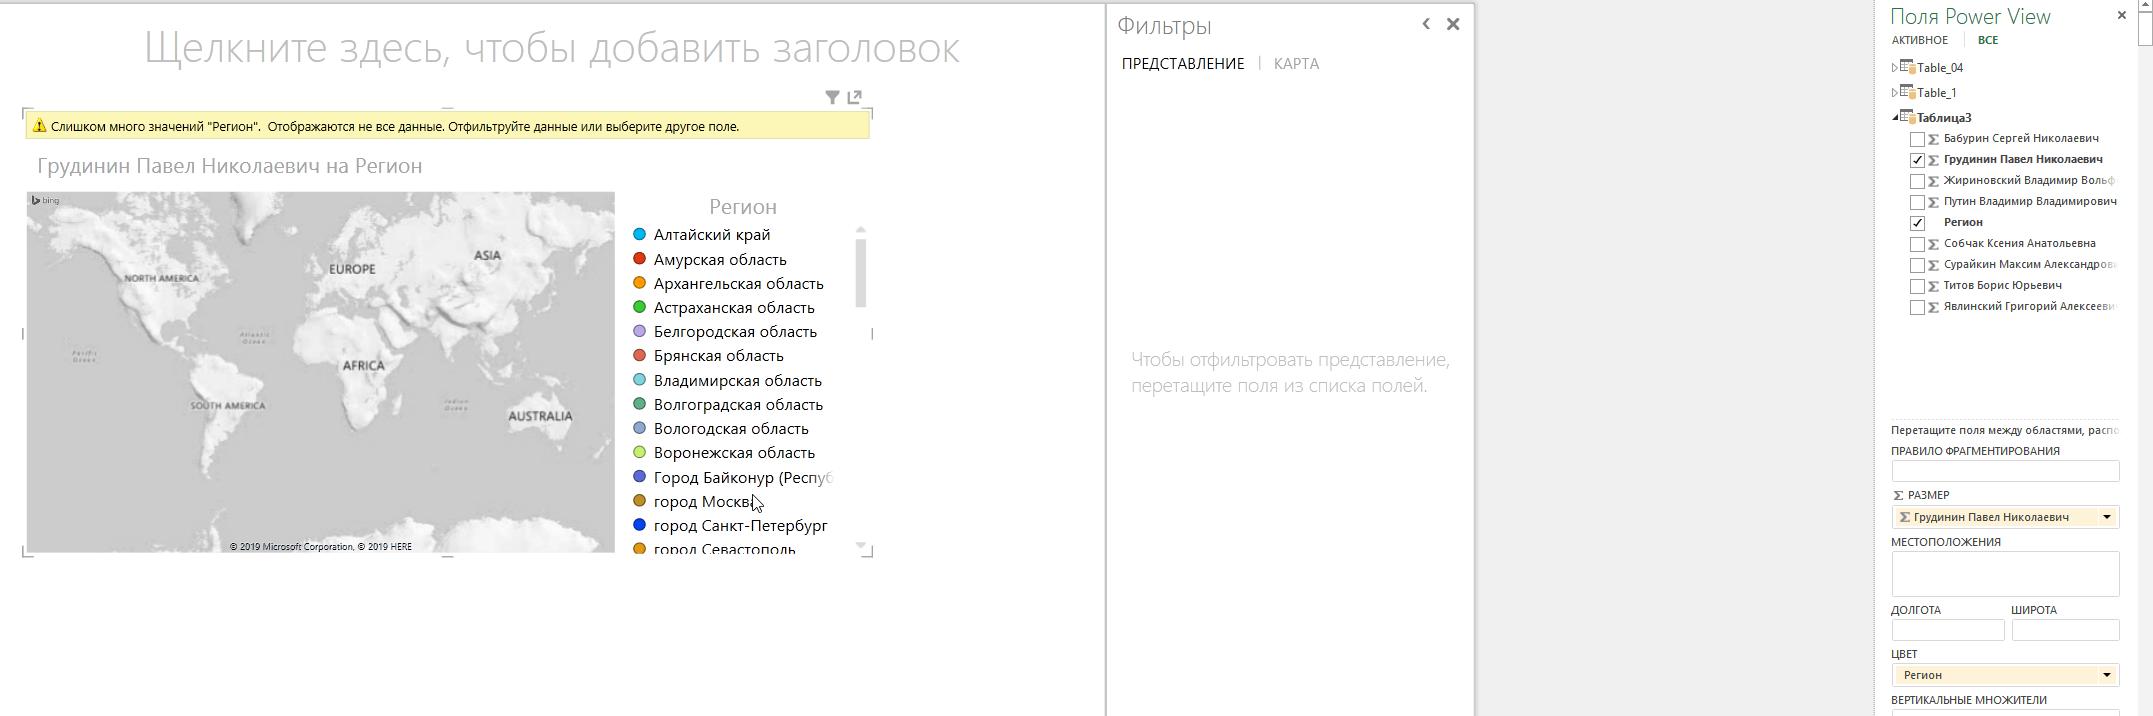 Power View в Excel